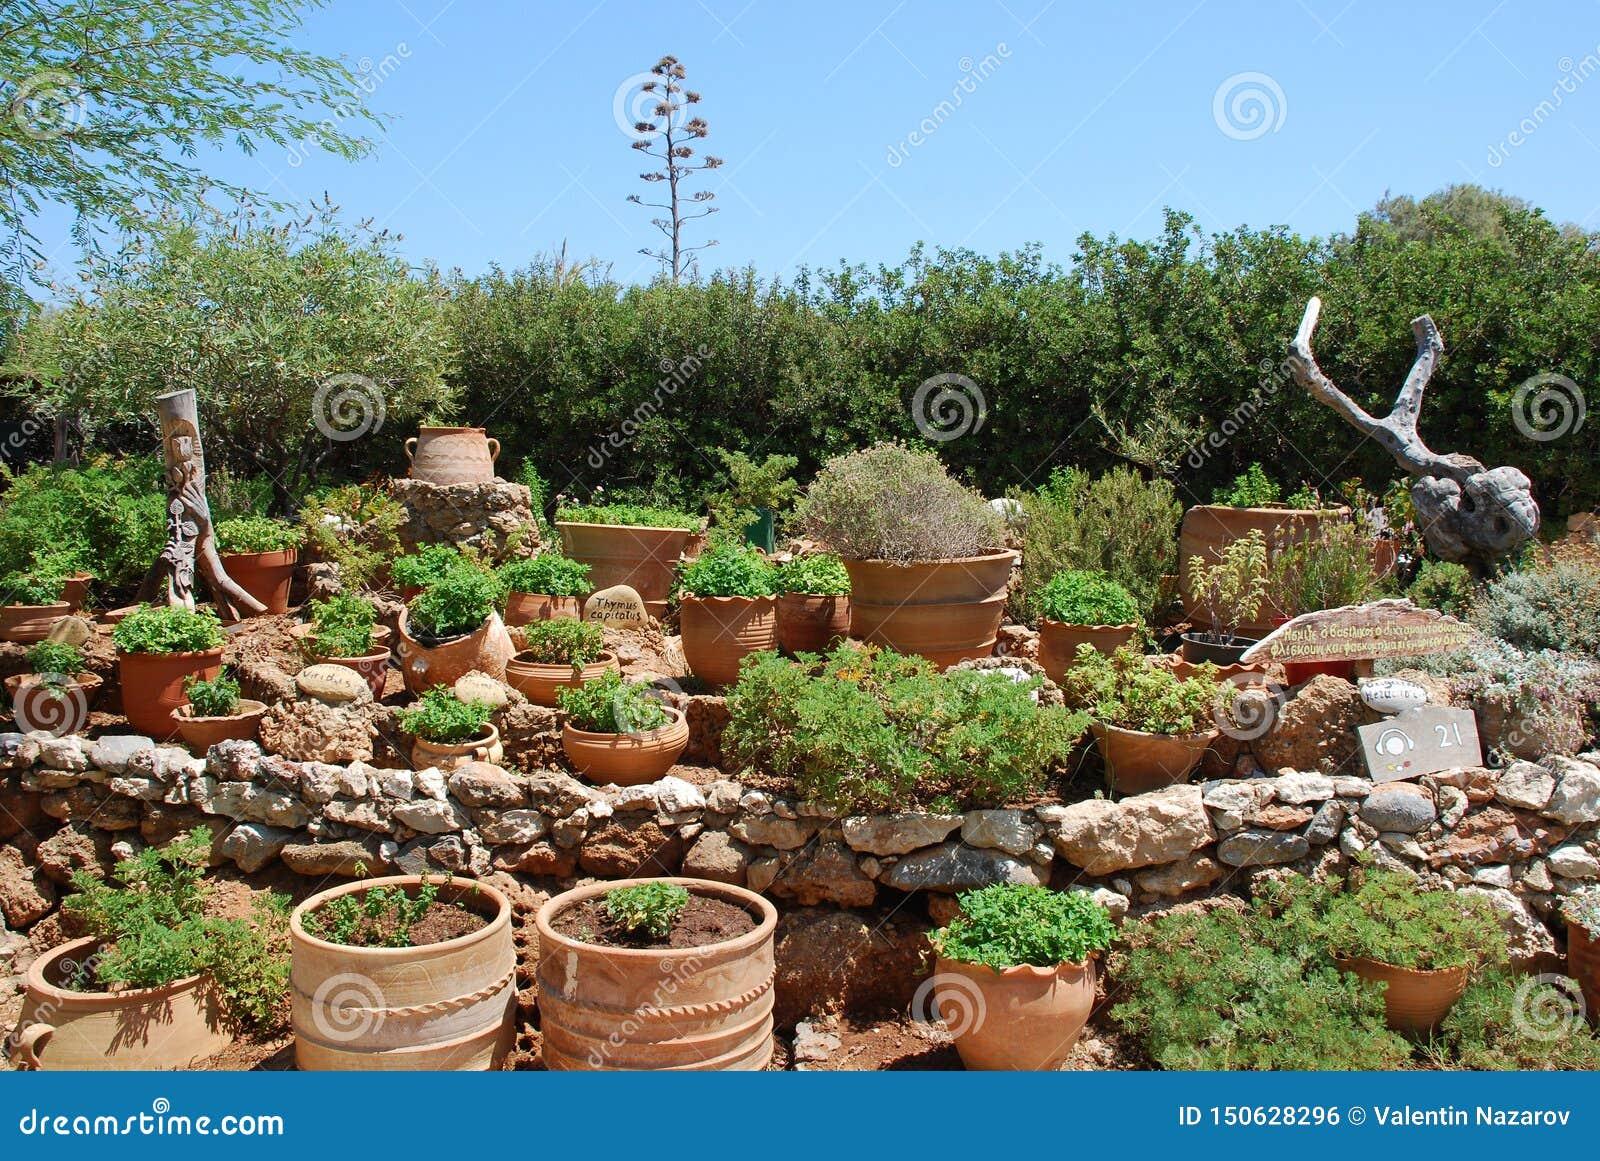 Chersonissos, Κύπρος, Ελλάδα - 31 07 2013: Κήπος των εγκαταστάσεων και των λουλουδιών που αυξάνονται στα δοχεία αργίλου